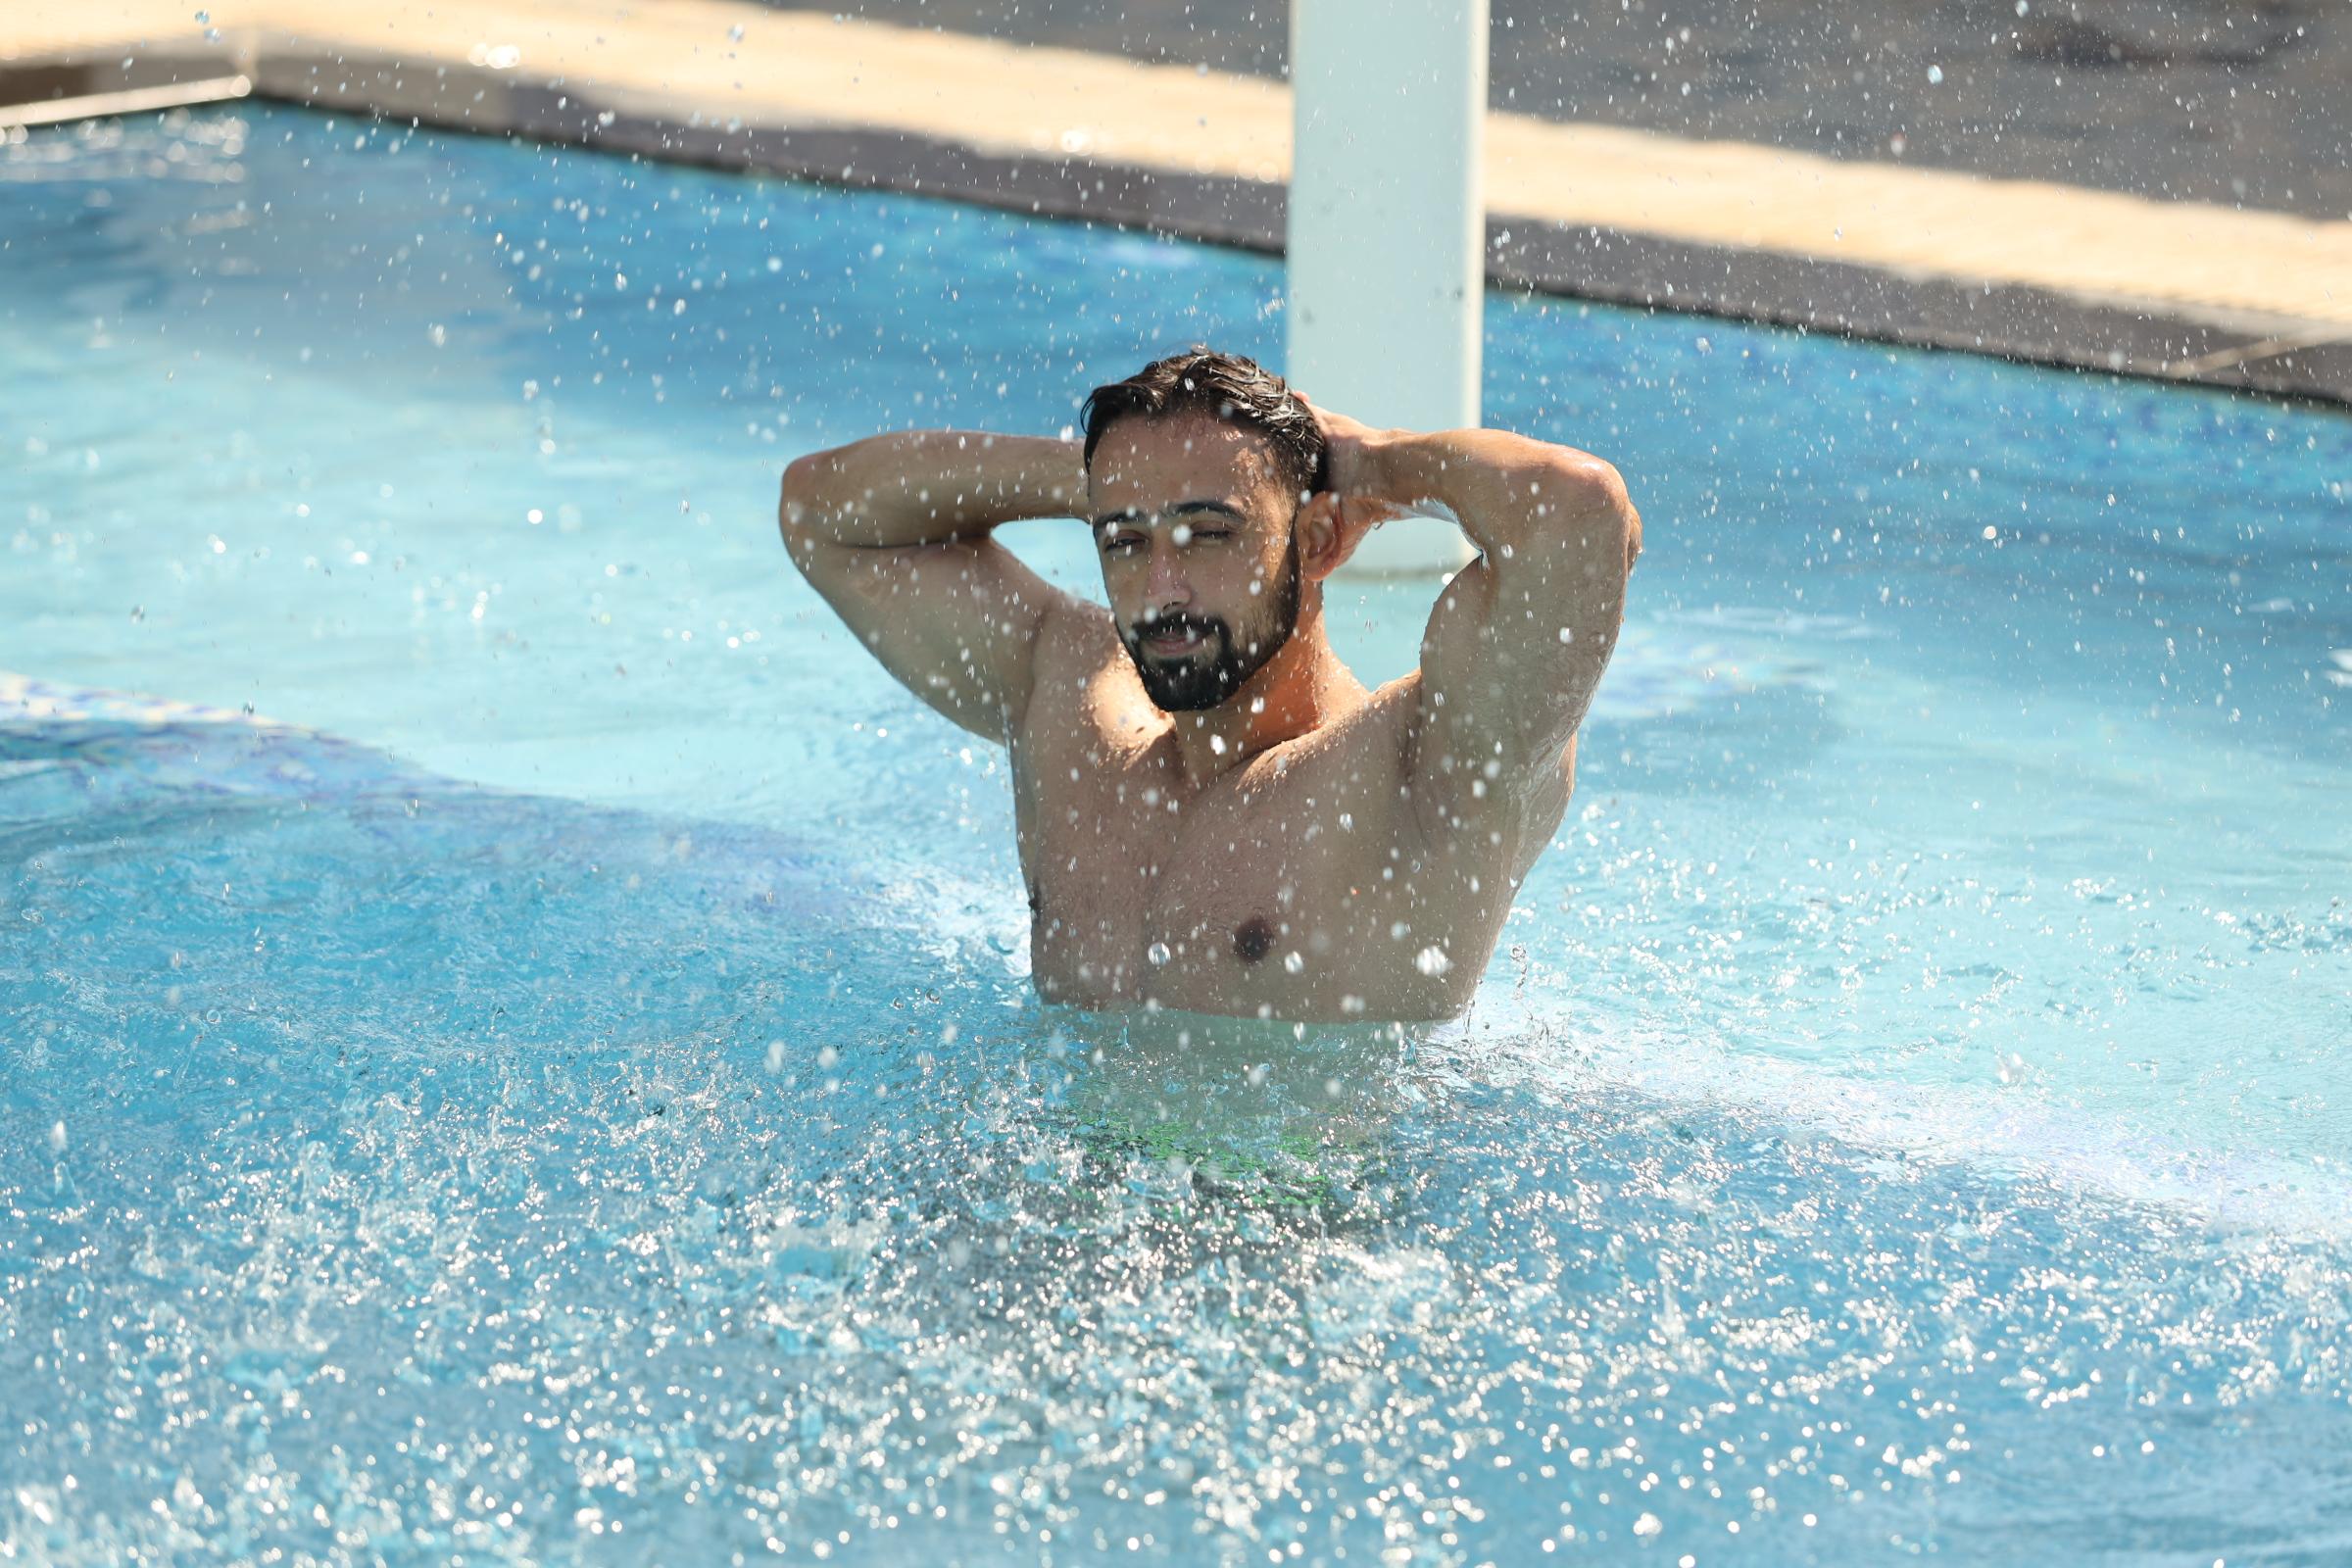 Guy posing in swimming pool